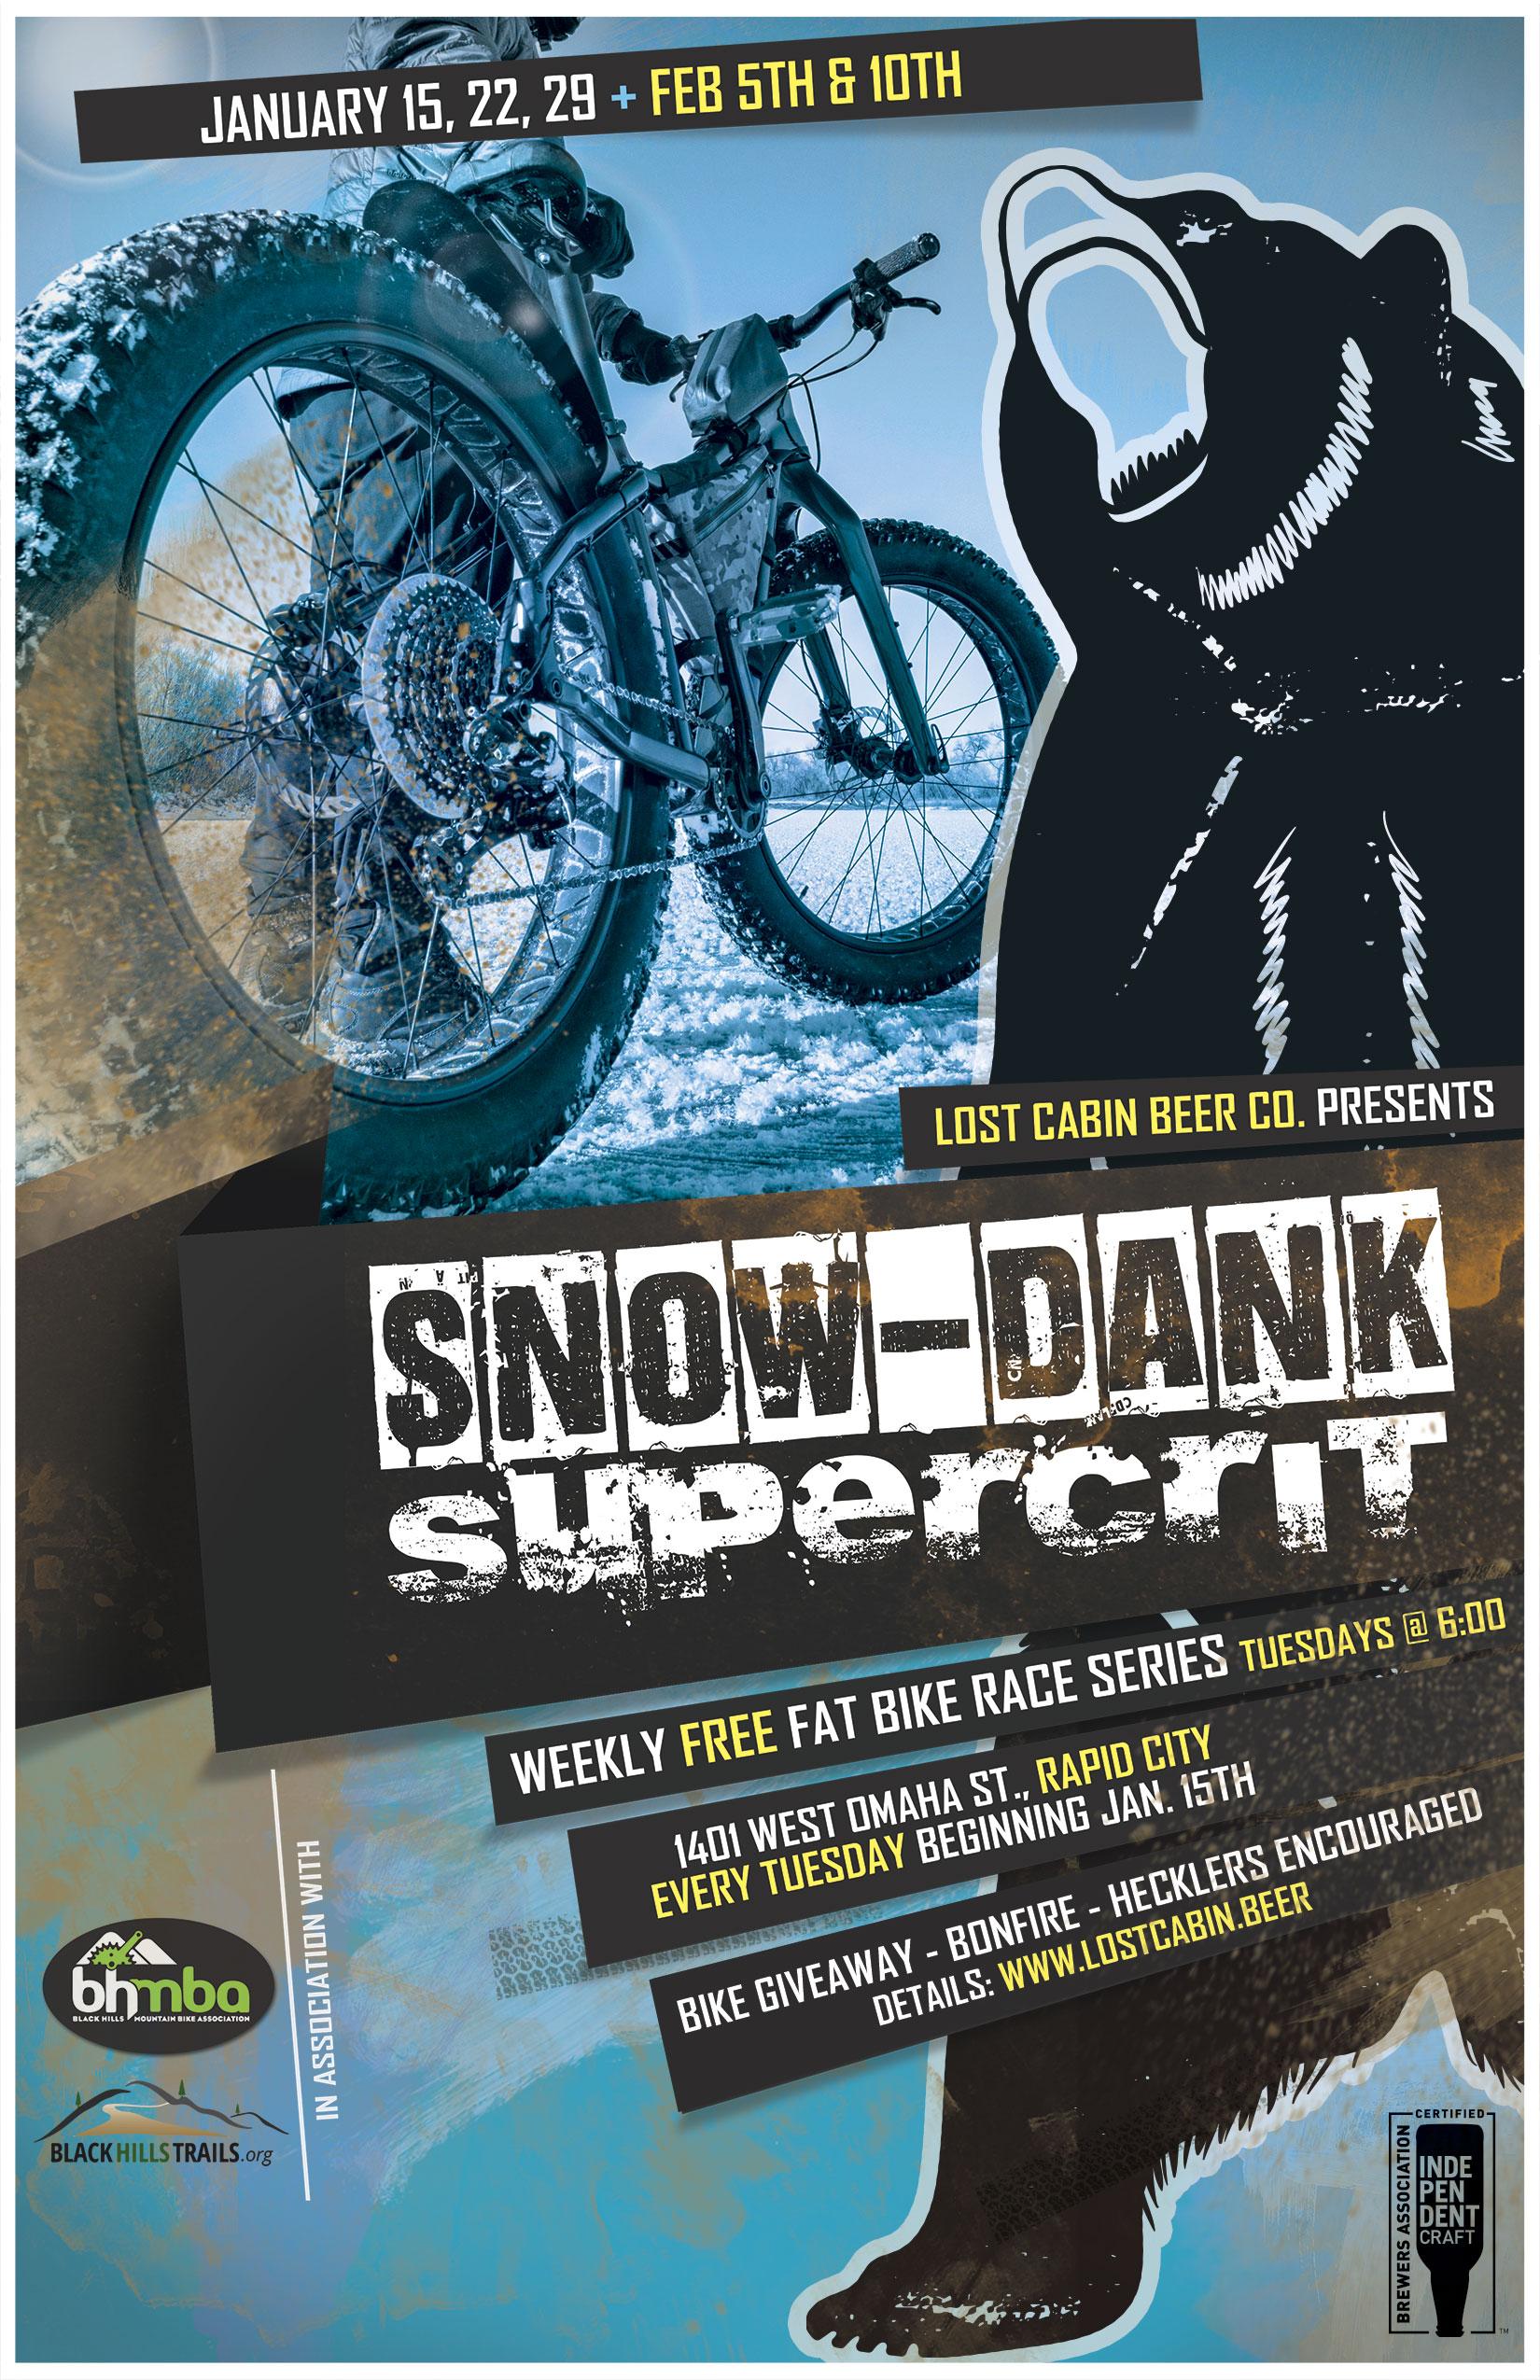 Snow-Dank Supercrit at Lost Cabin in Rapid City, South Dakota